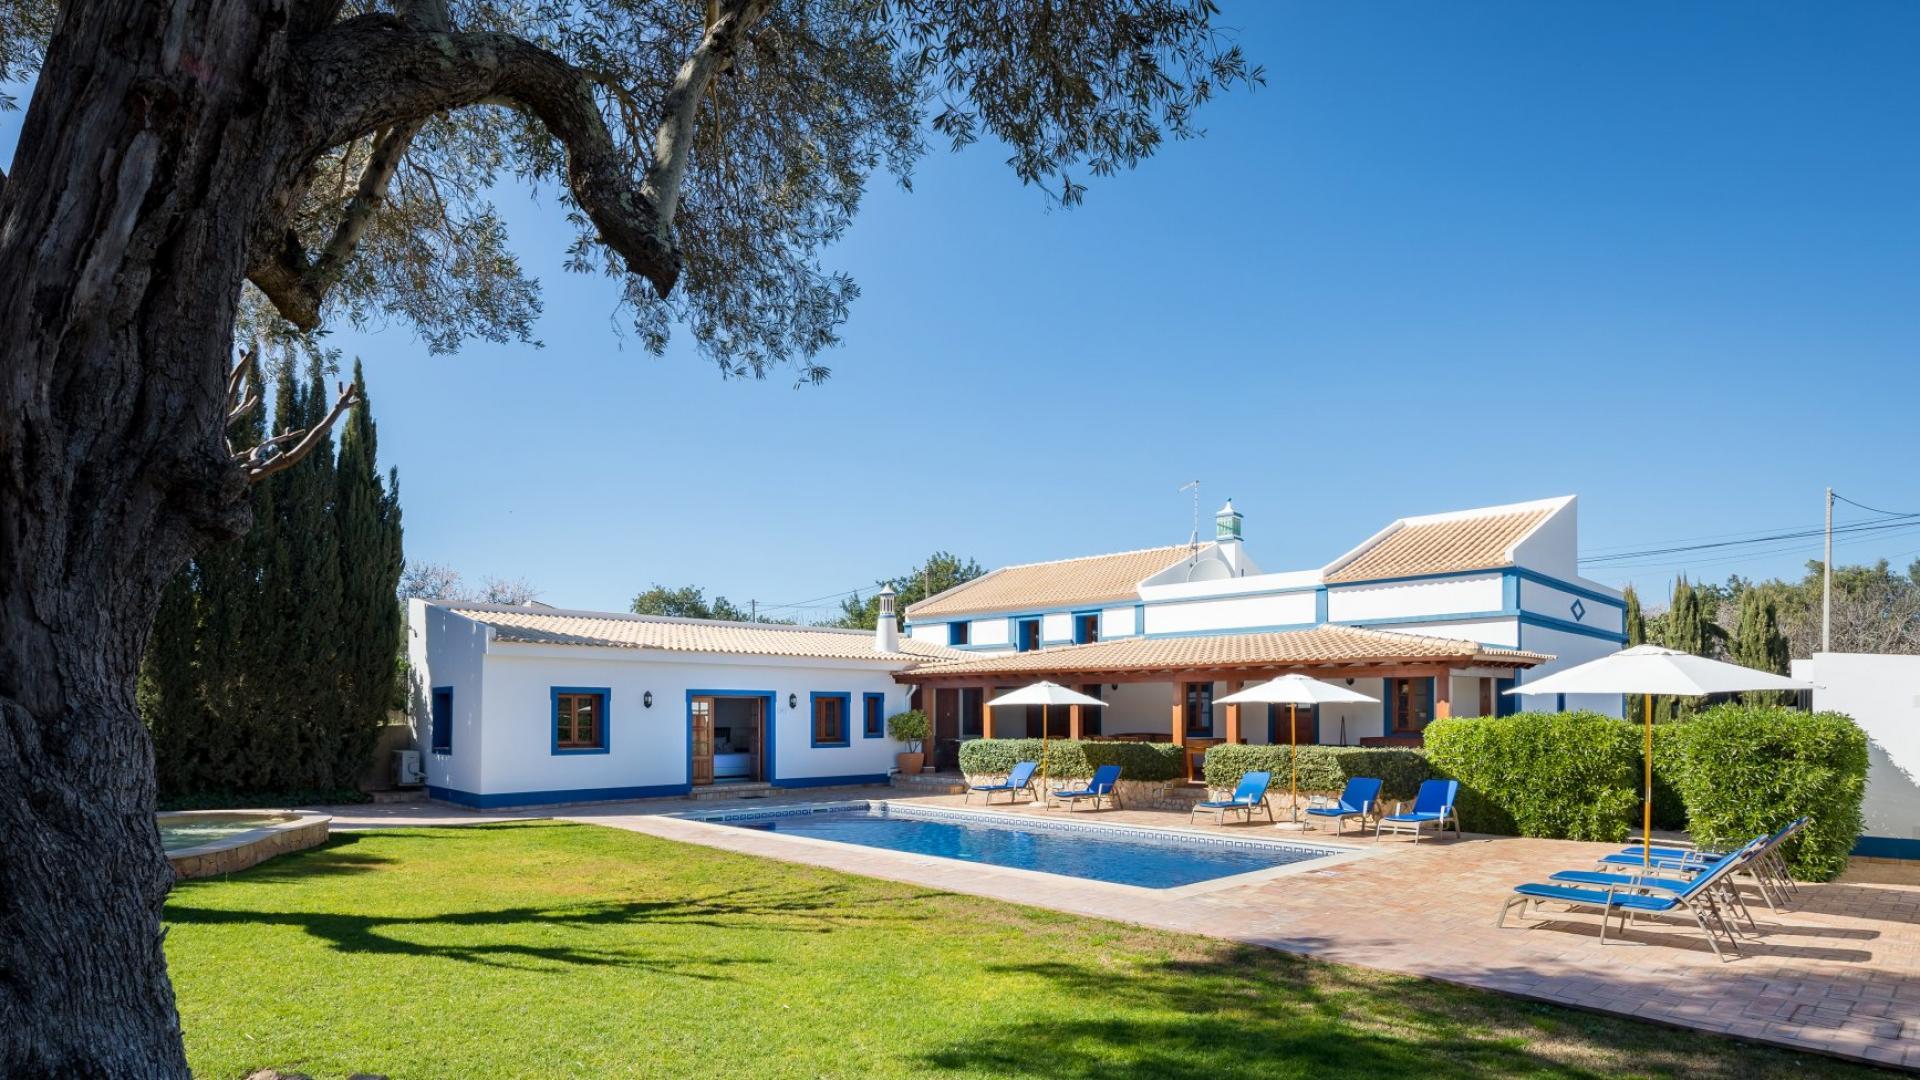 Villa Inglês - Boliqueime, Algarve - _55A5480-HDR_1.jpg